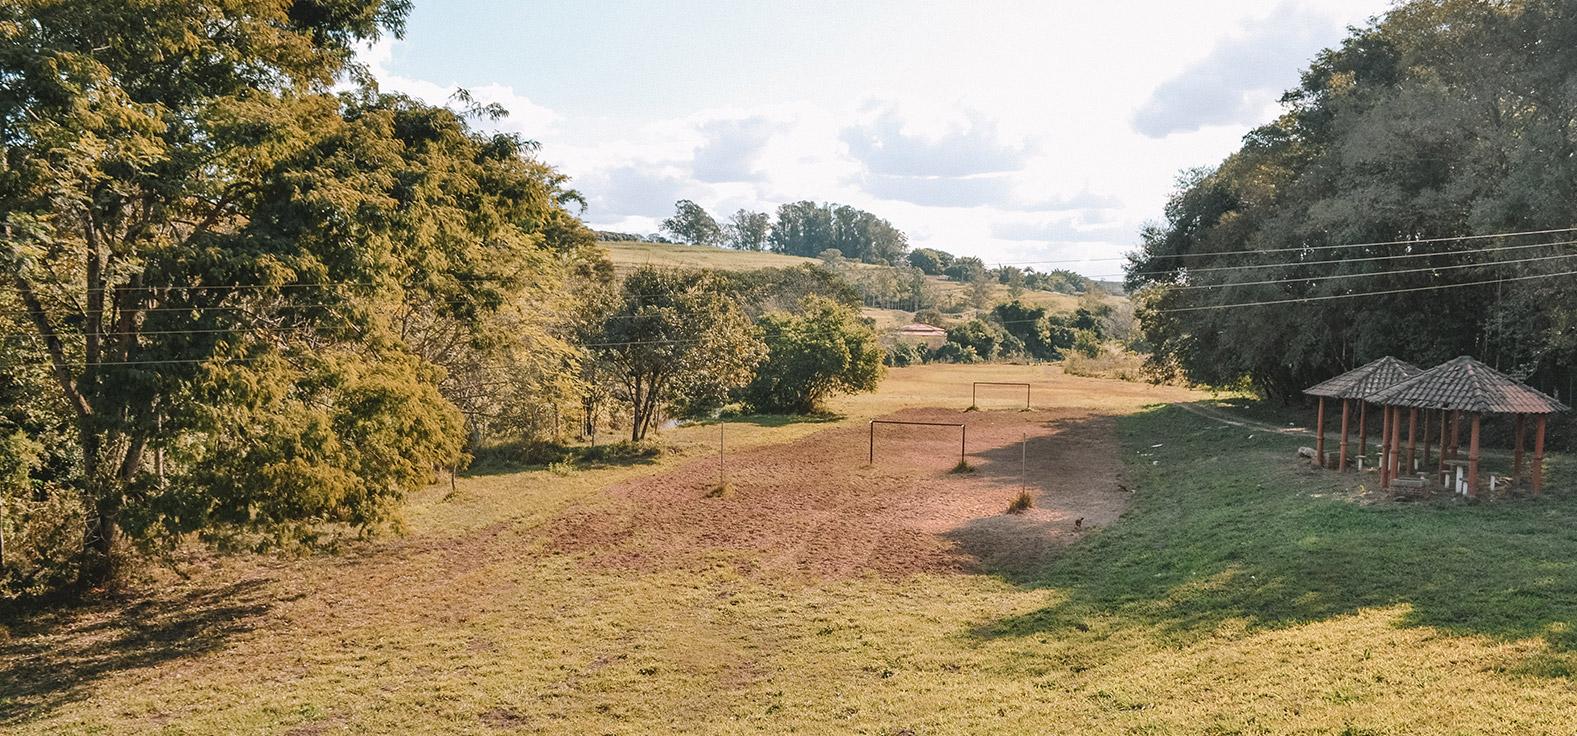 Prainha em Corumbataí | Portal Serra do Itaquerí